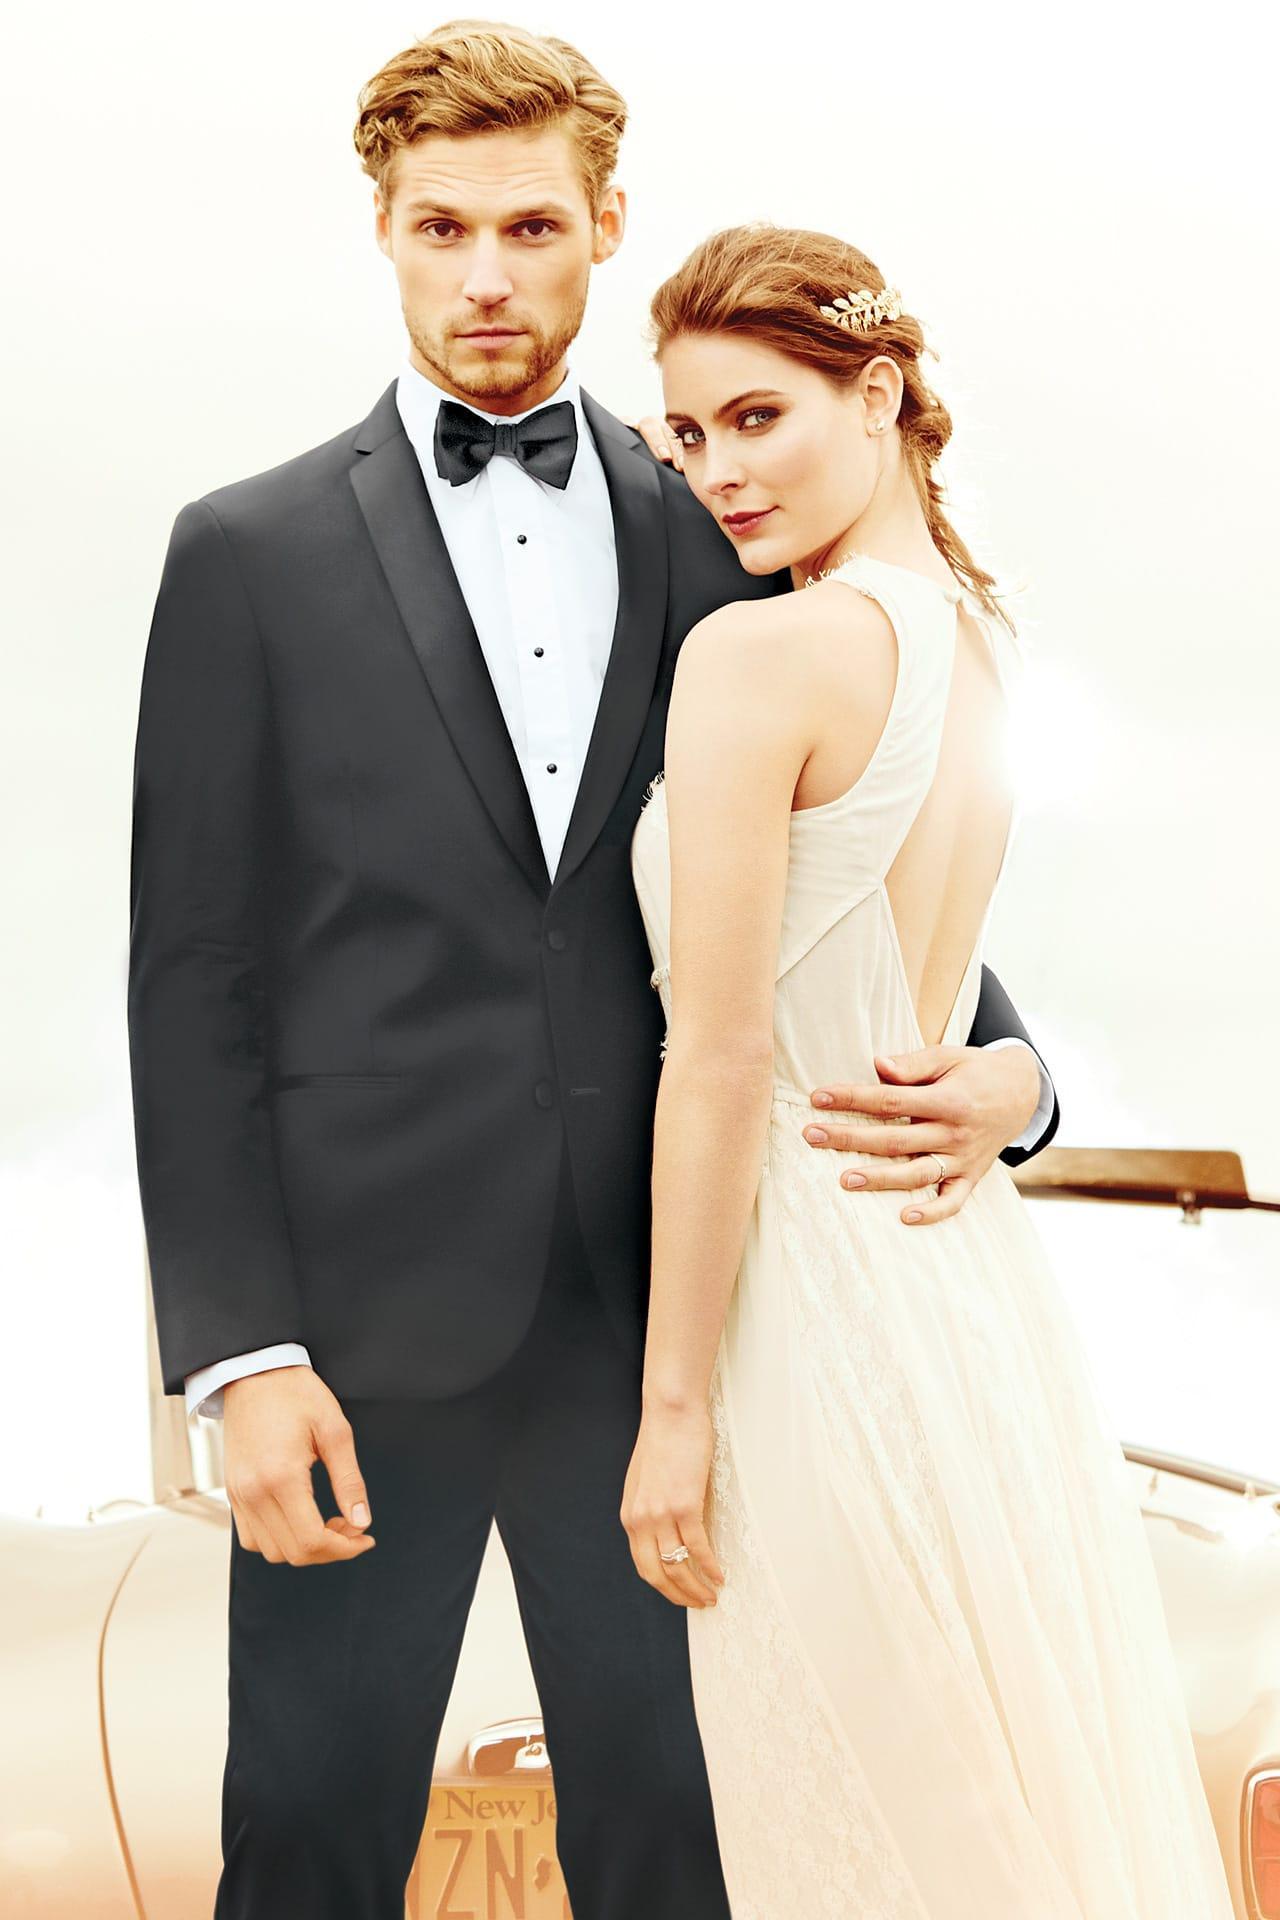 wedding-tuxedo-black-michael-kors-berkeley-990-1.jpg